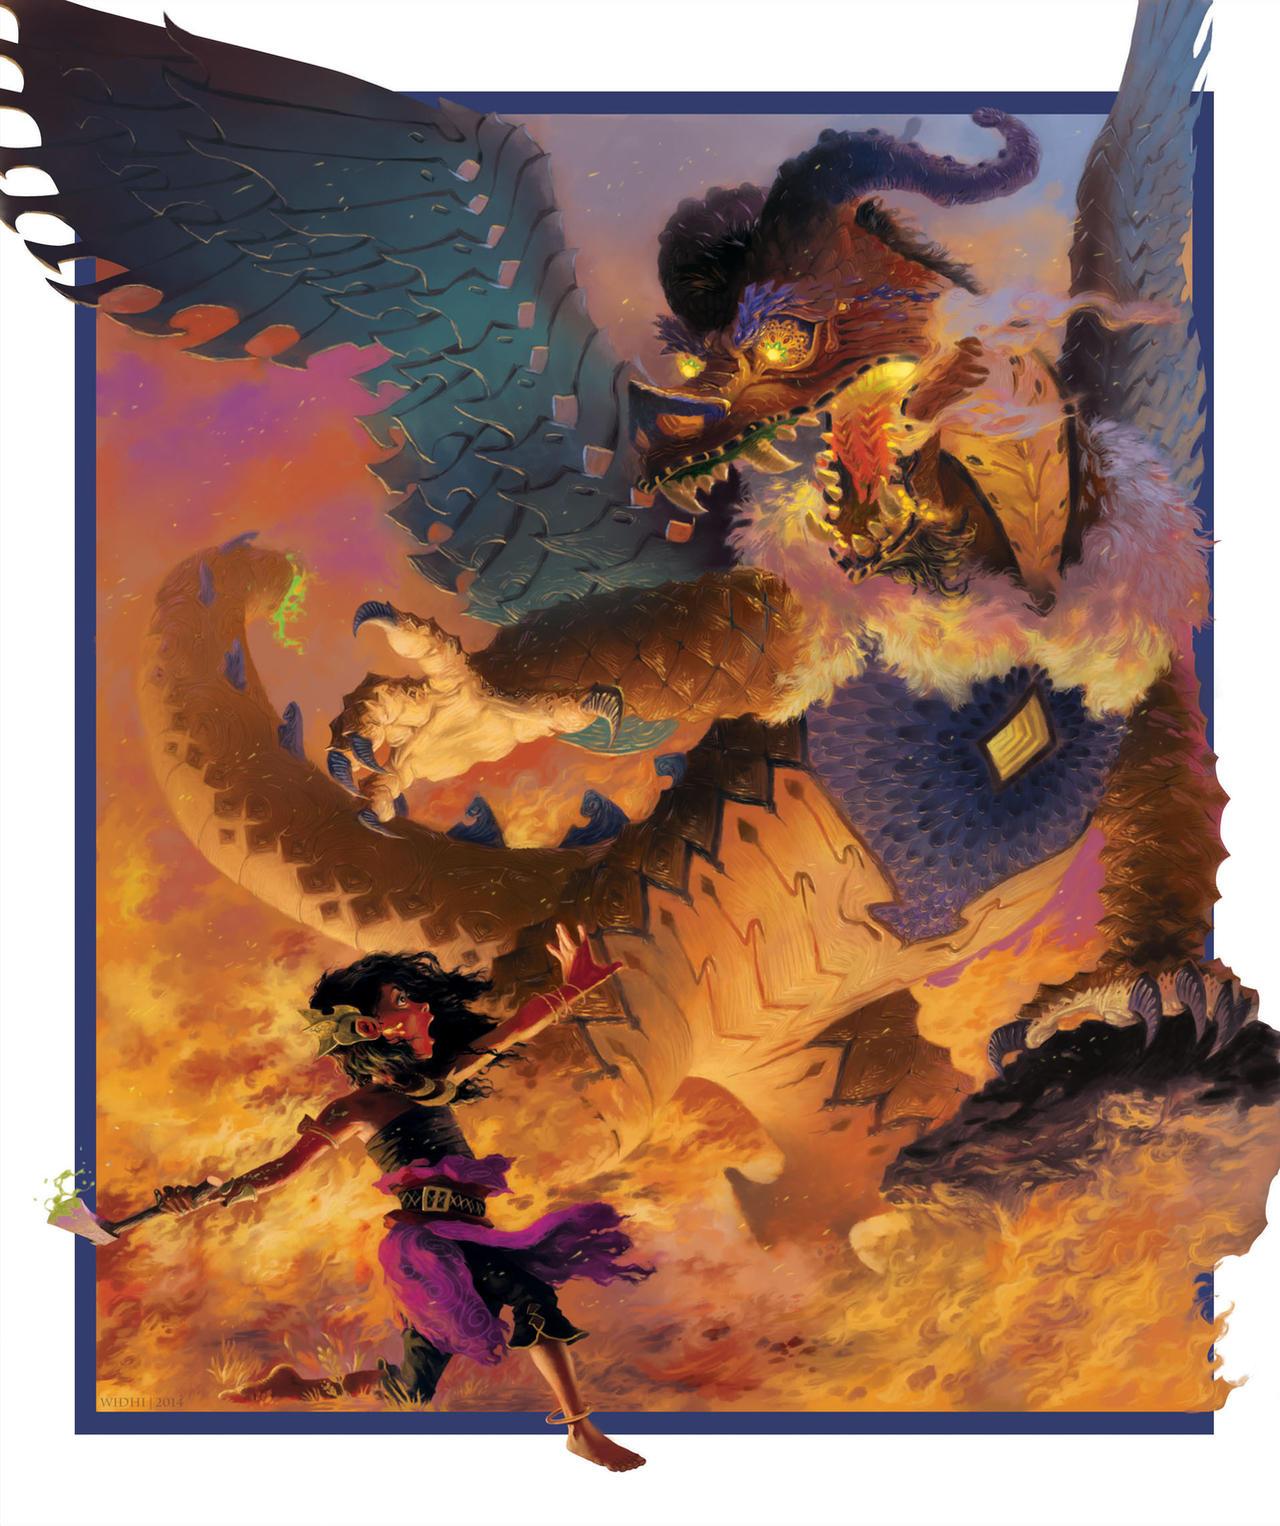 Amanda and the Dragon